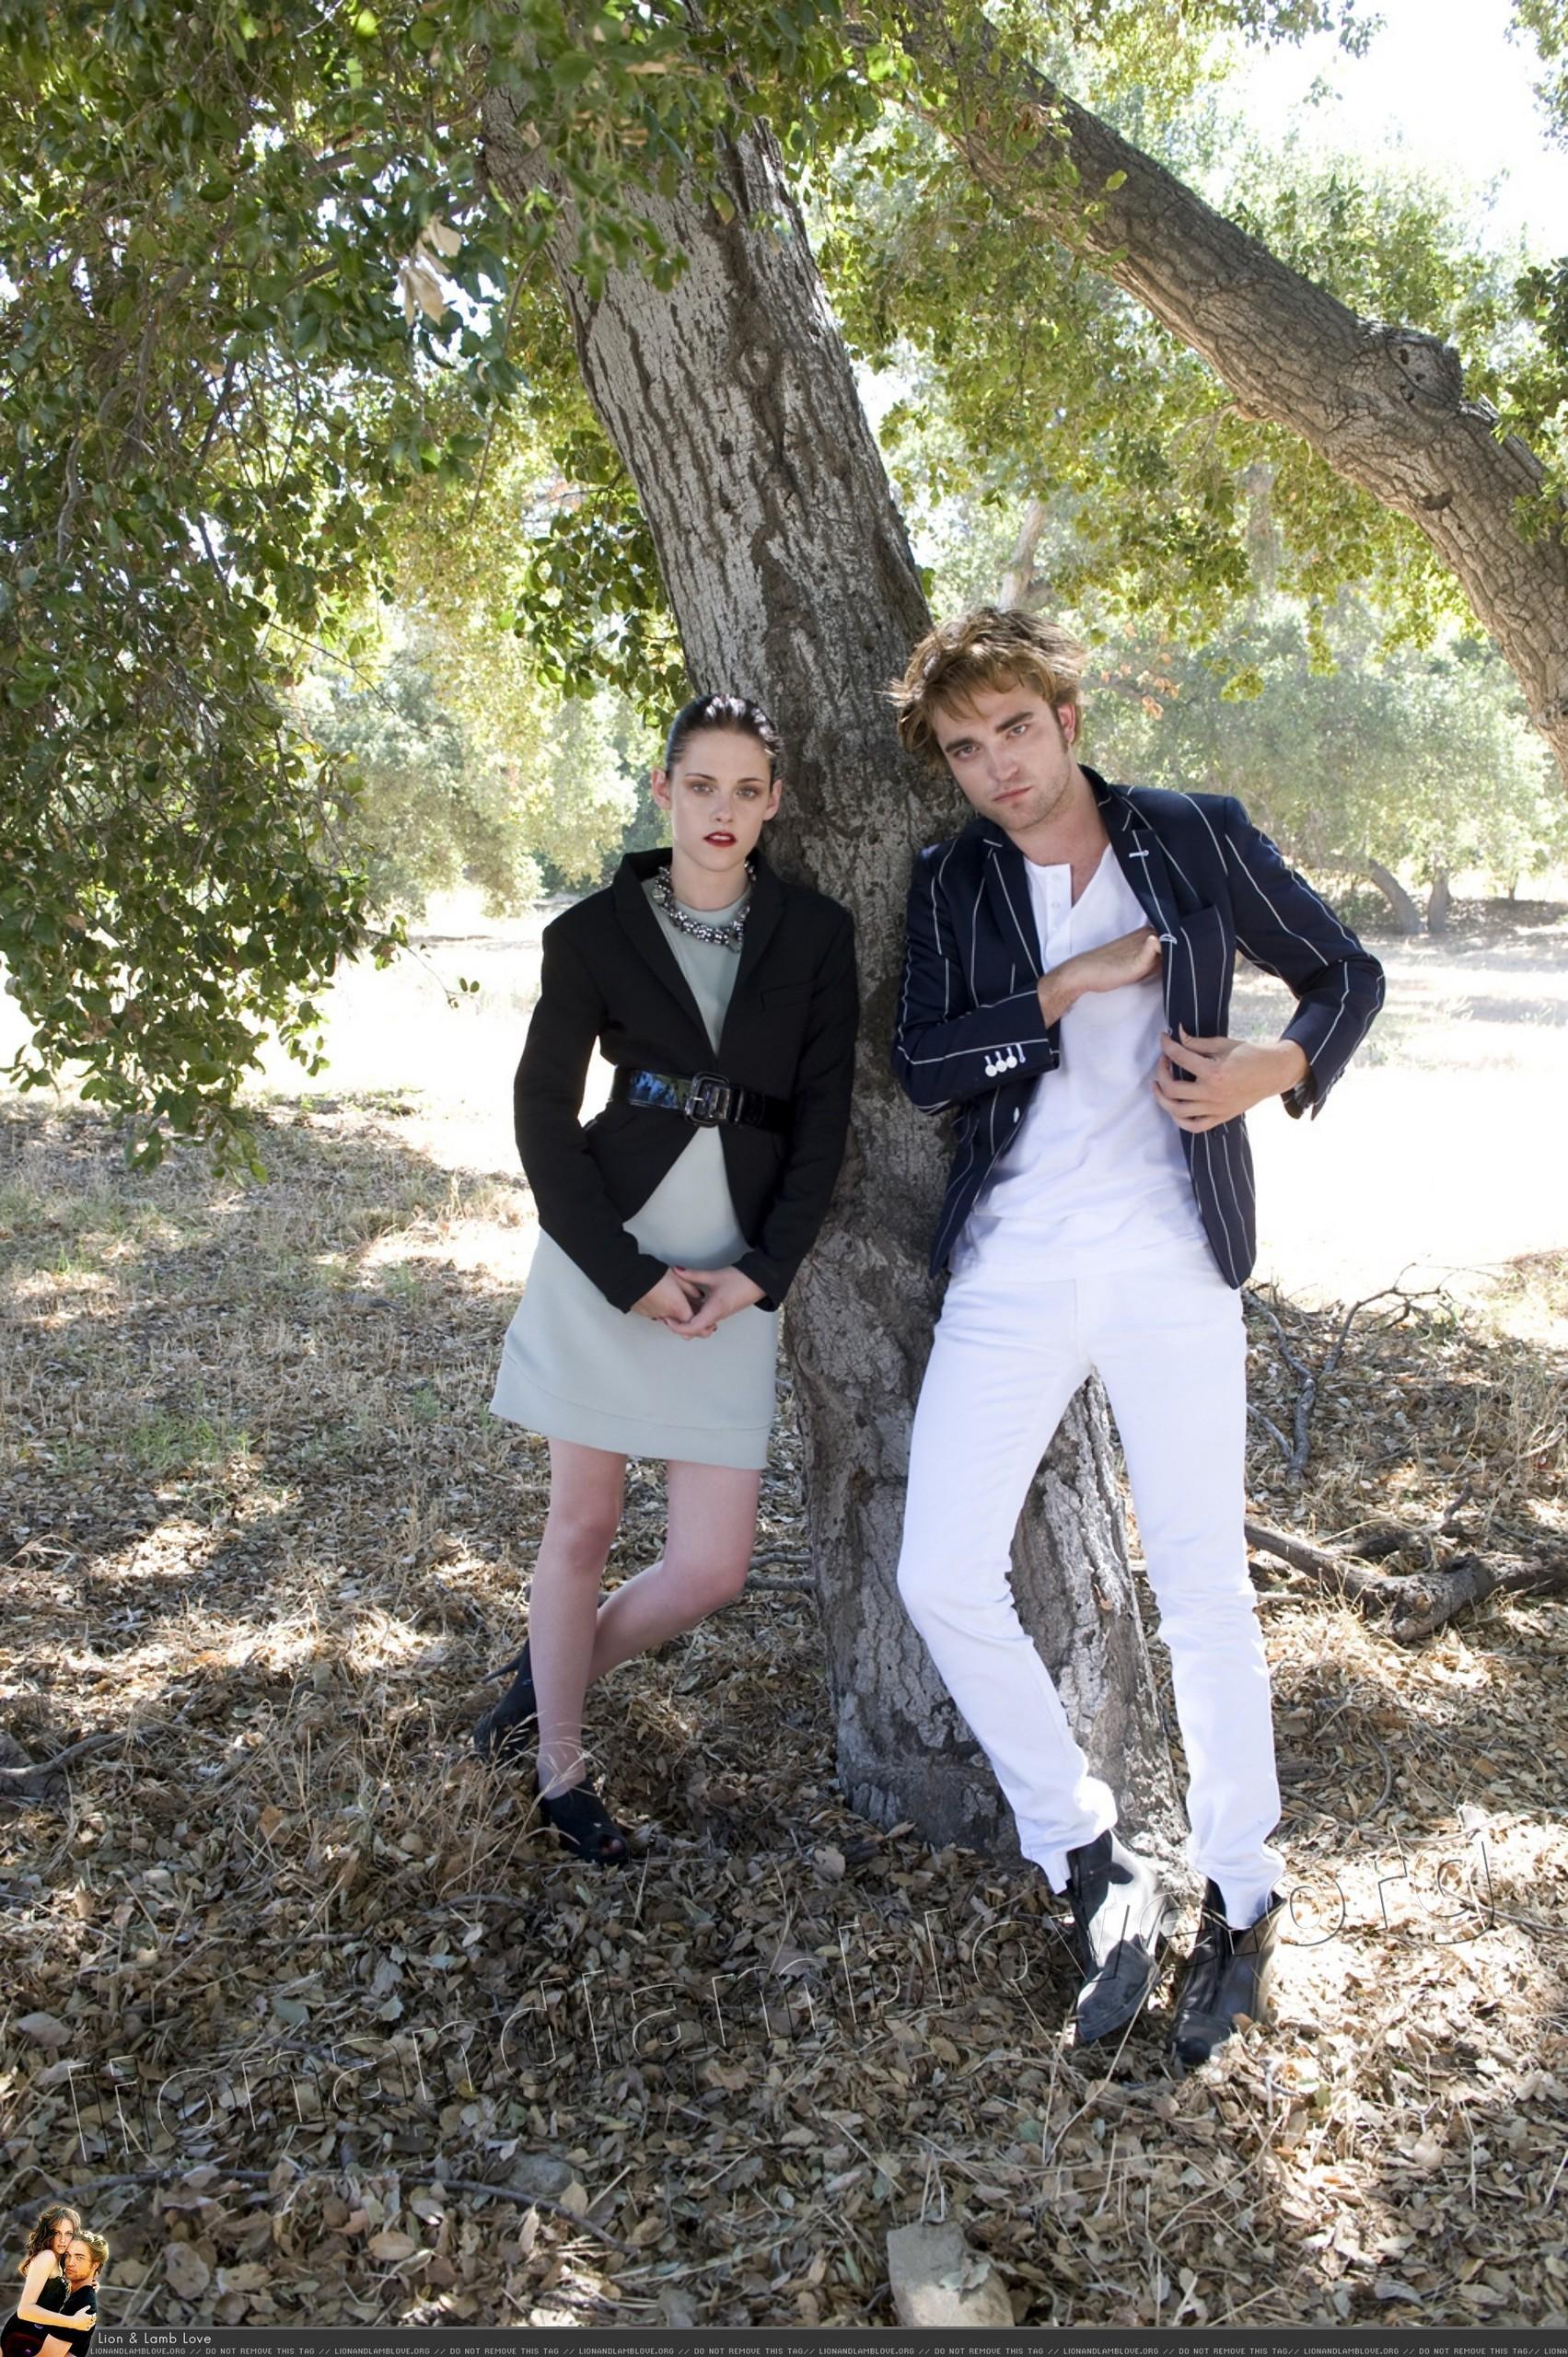 twilight HQ Teen Vogue